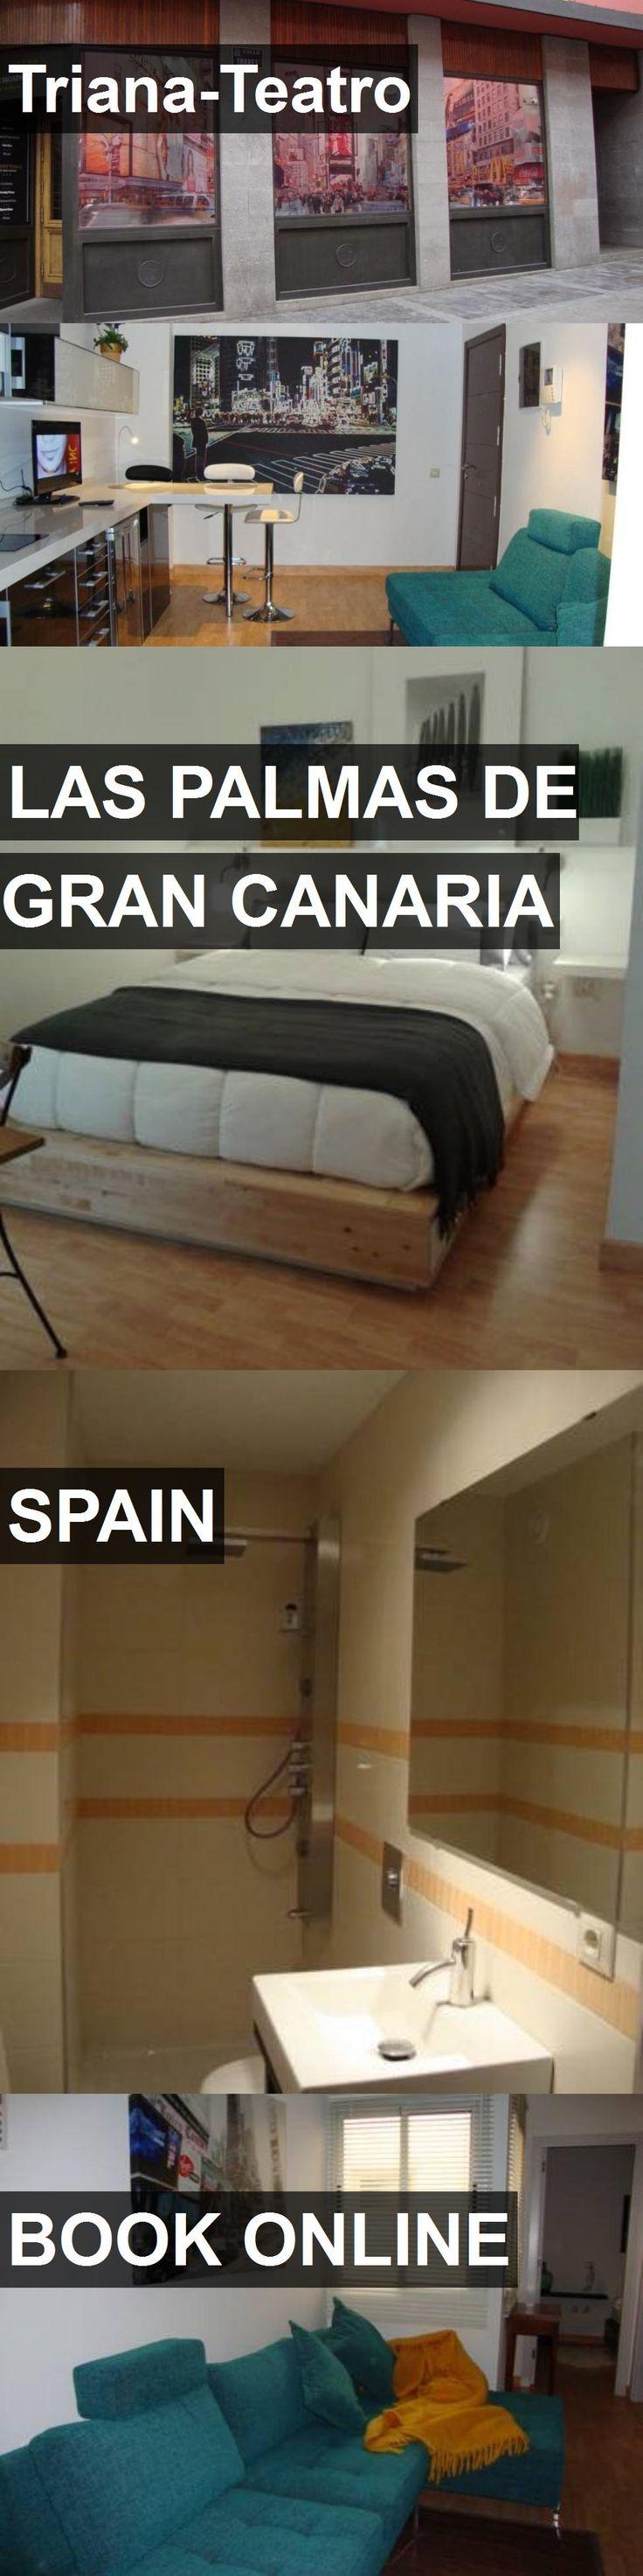 Hotel Triana-Teatro in Las Palmas de Gran Canaria, Spain. For more information, photos, reviews and best prices please follow the link. #Spain #LasPalmasdeGranCanaria #hotel #travel #vacation